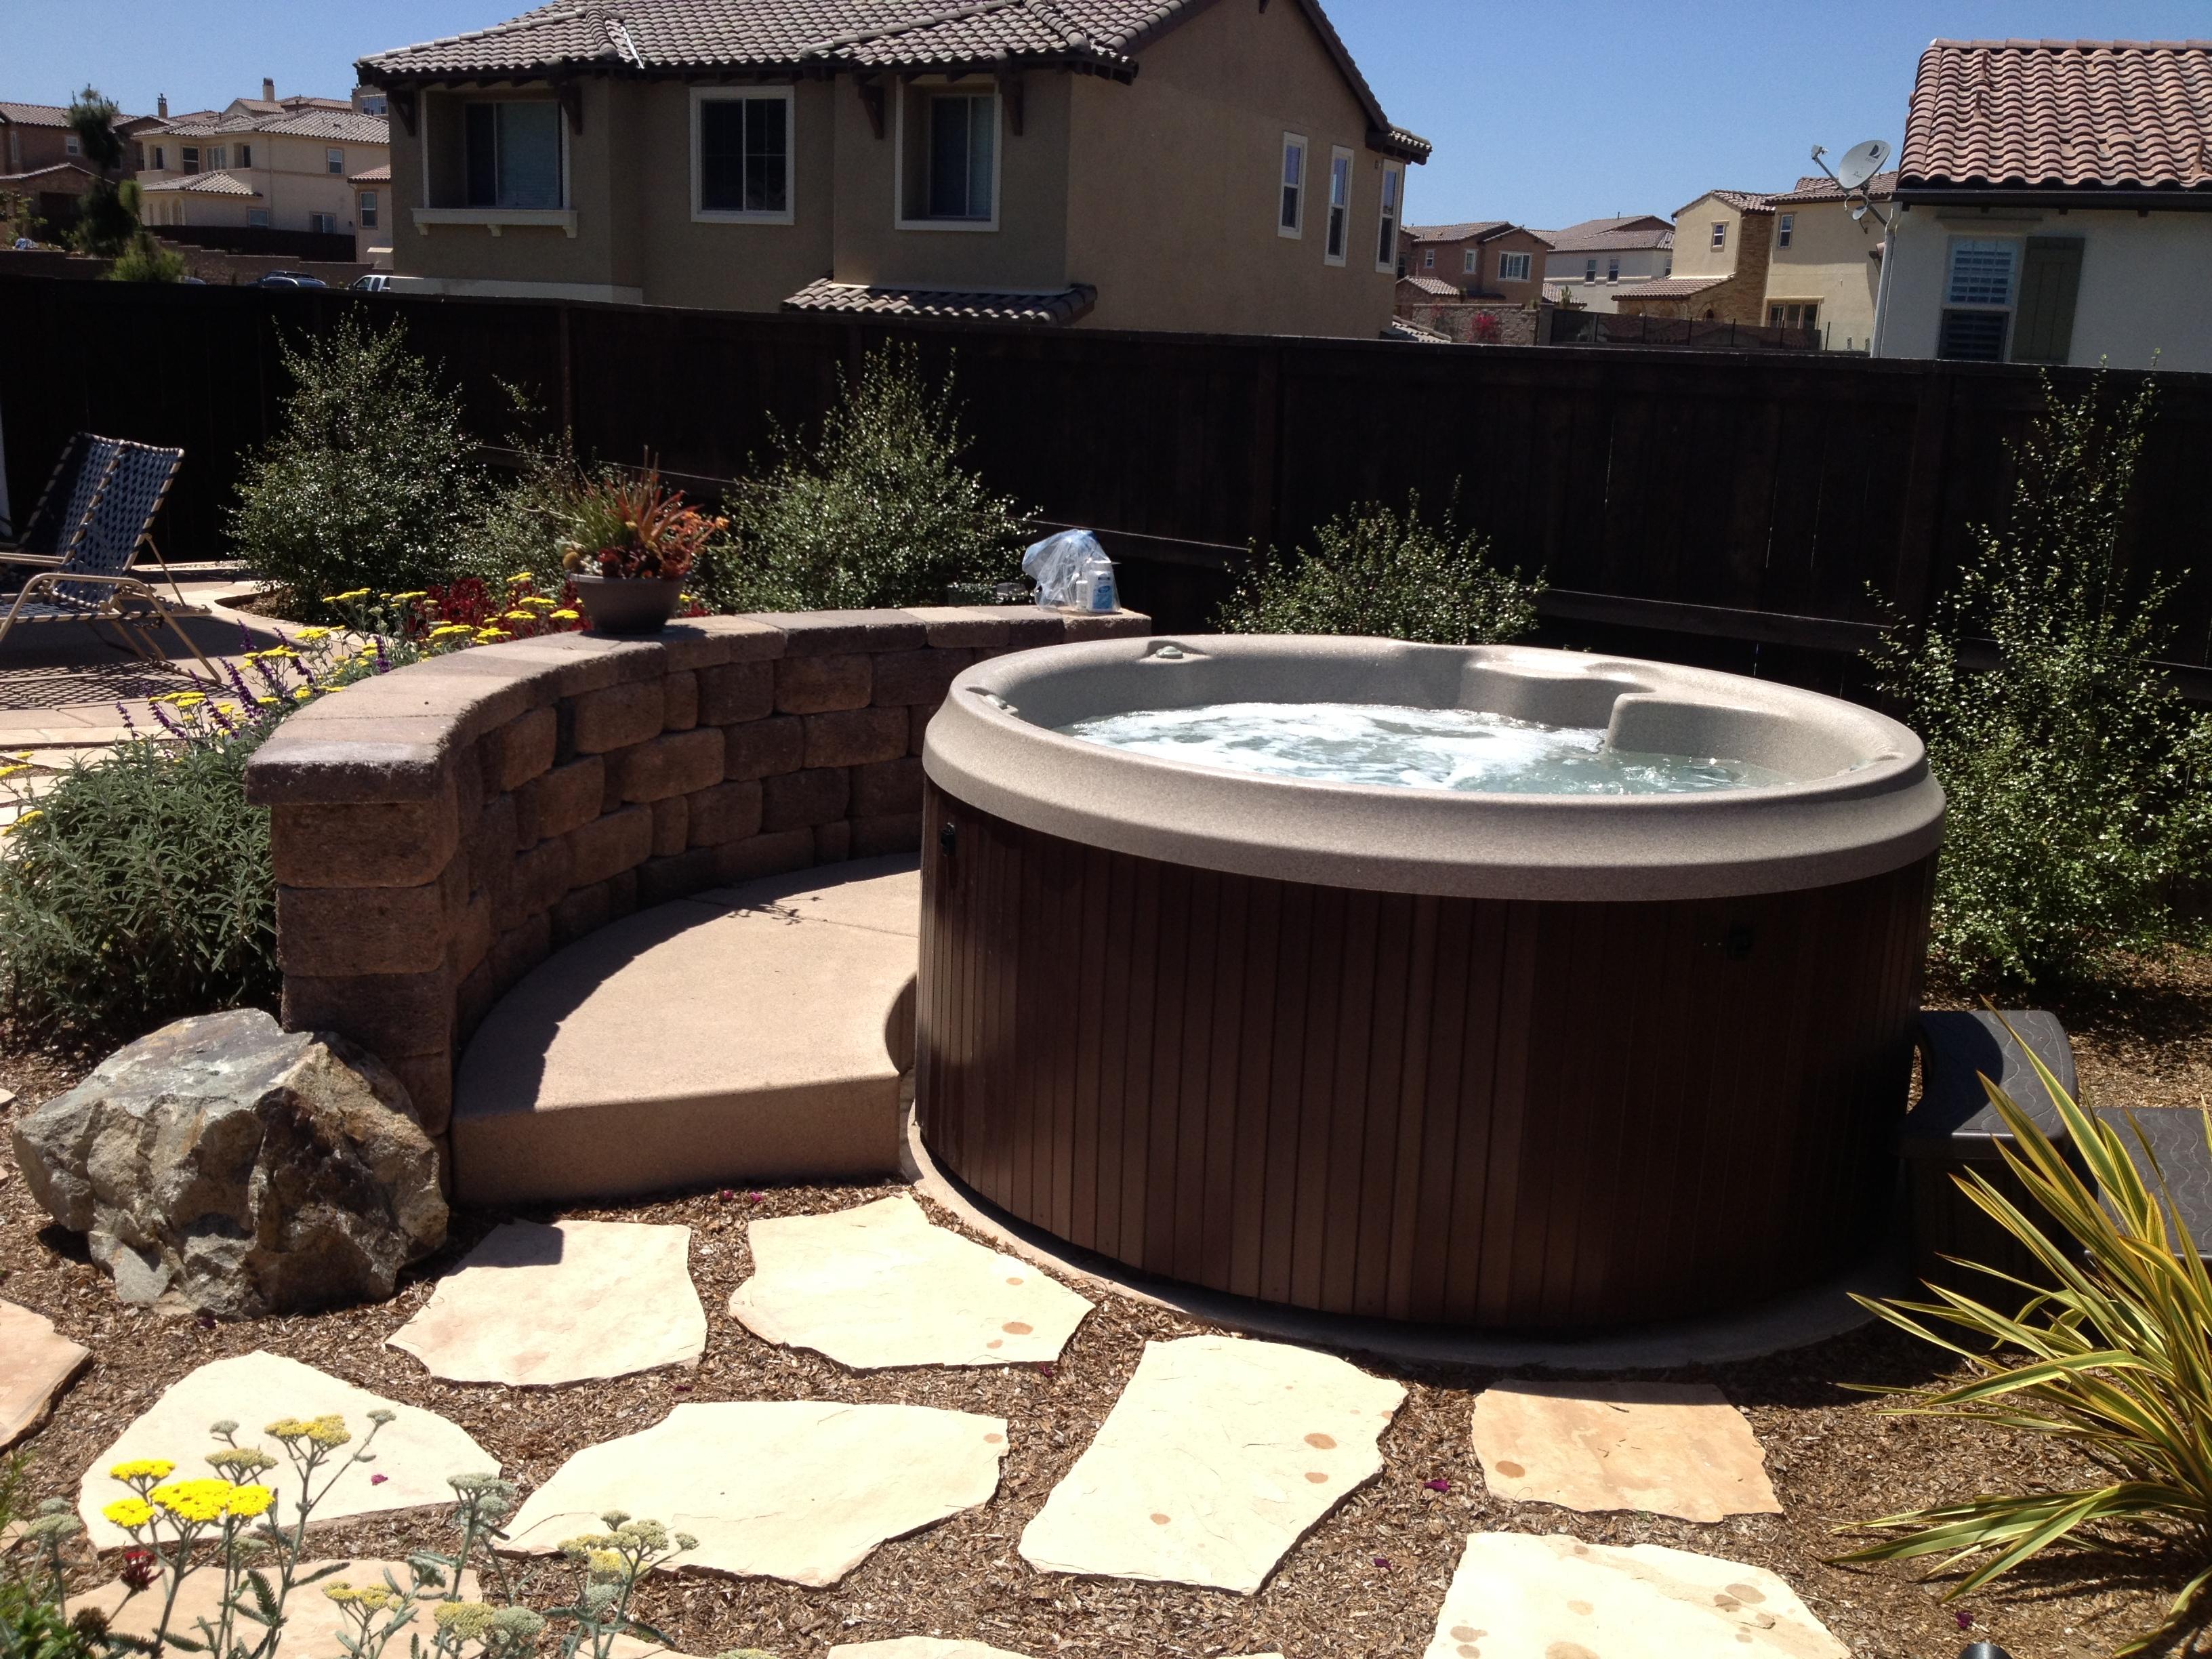 Fullsize Of Round Hot Tub